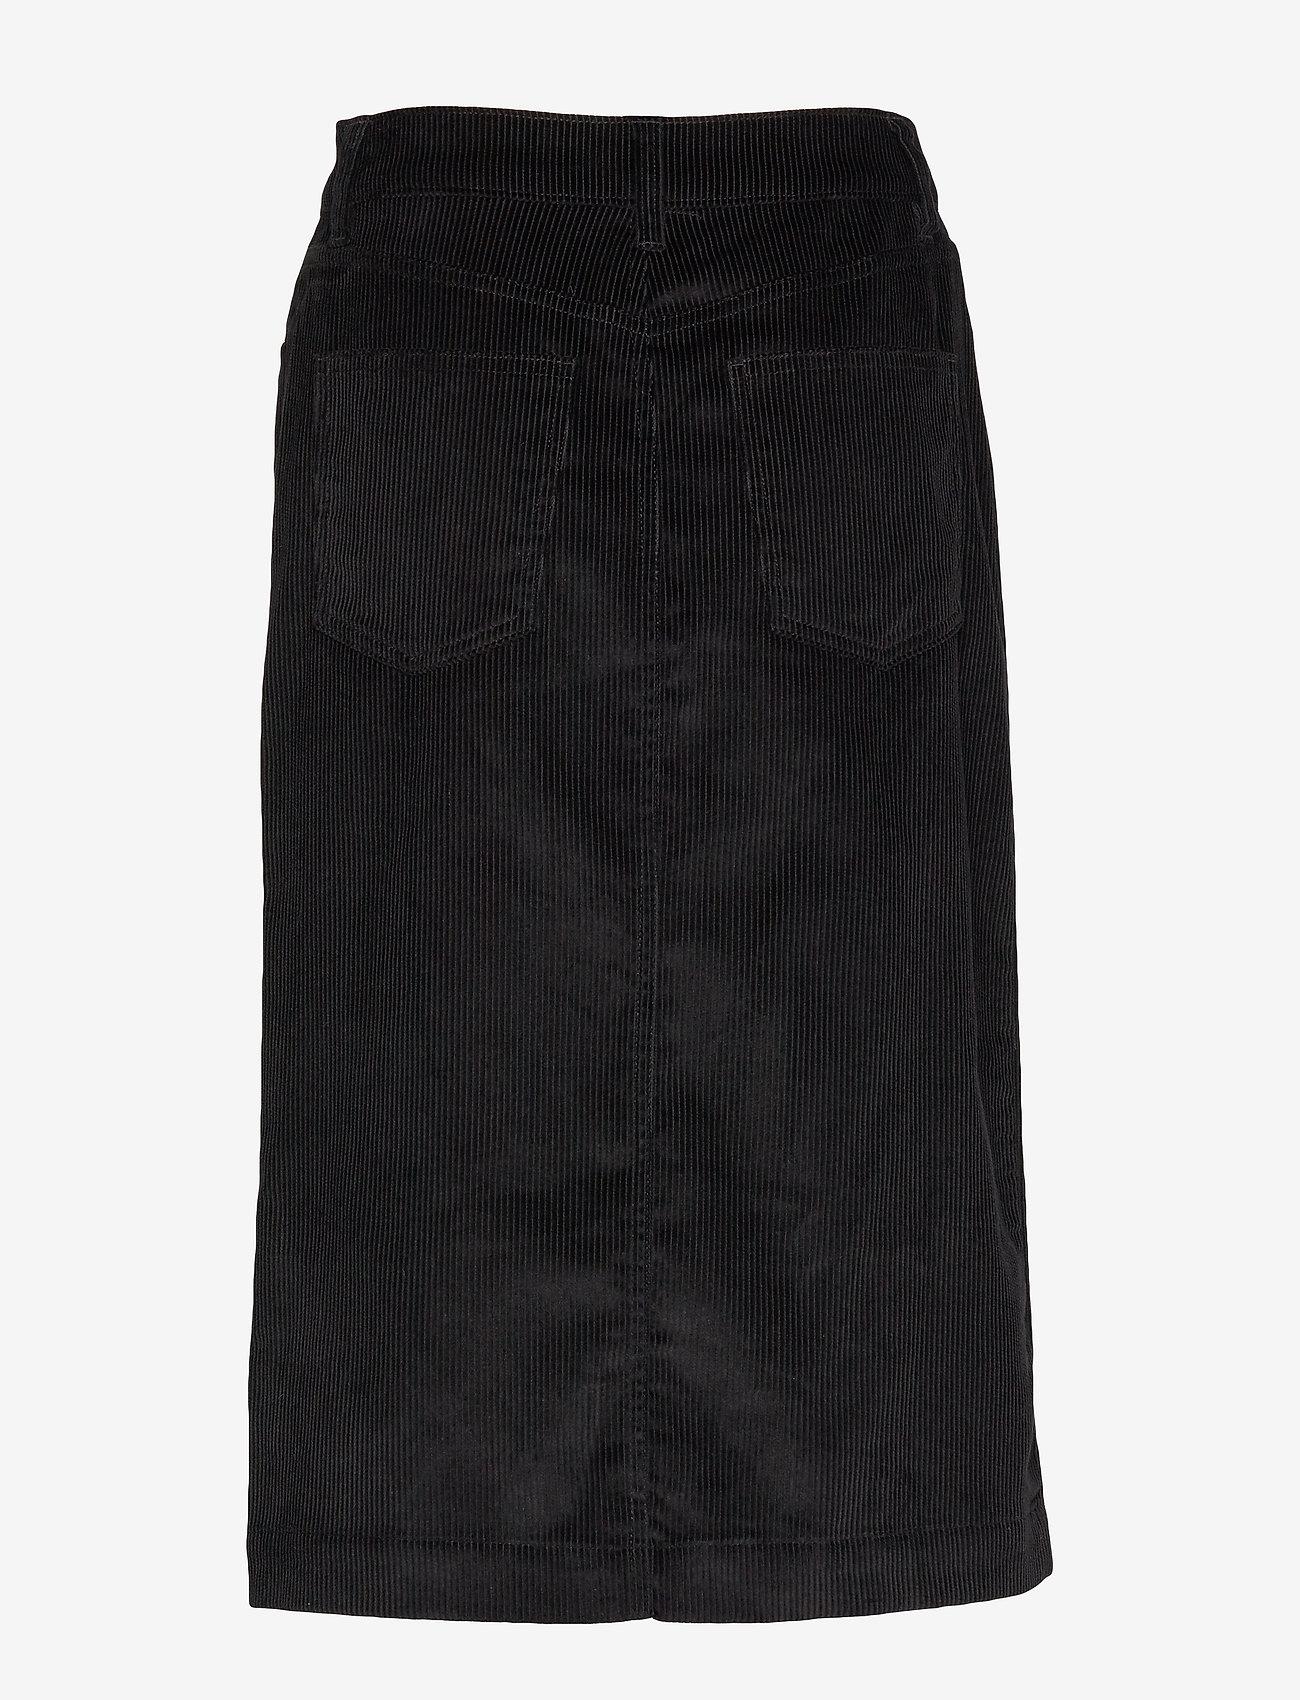 GAP Corduroy Button-Front Midi Skirt - Spódnice TRUE BLACK V2 3 - Kobiety Odzież.